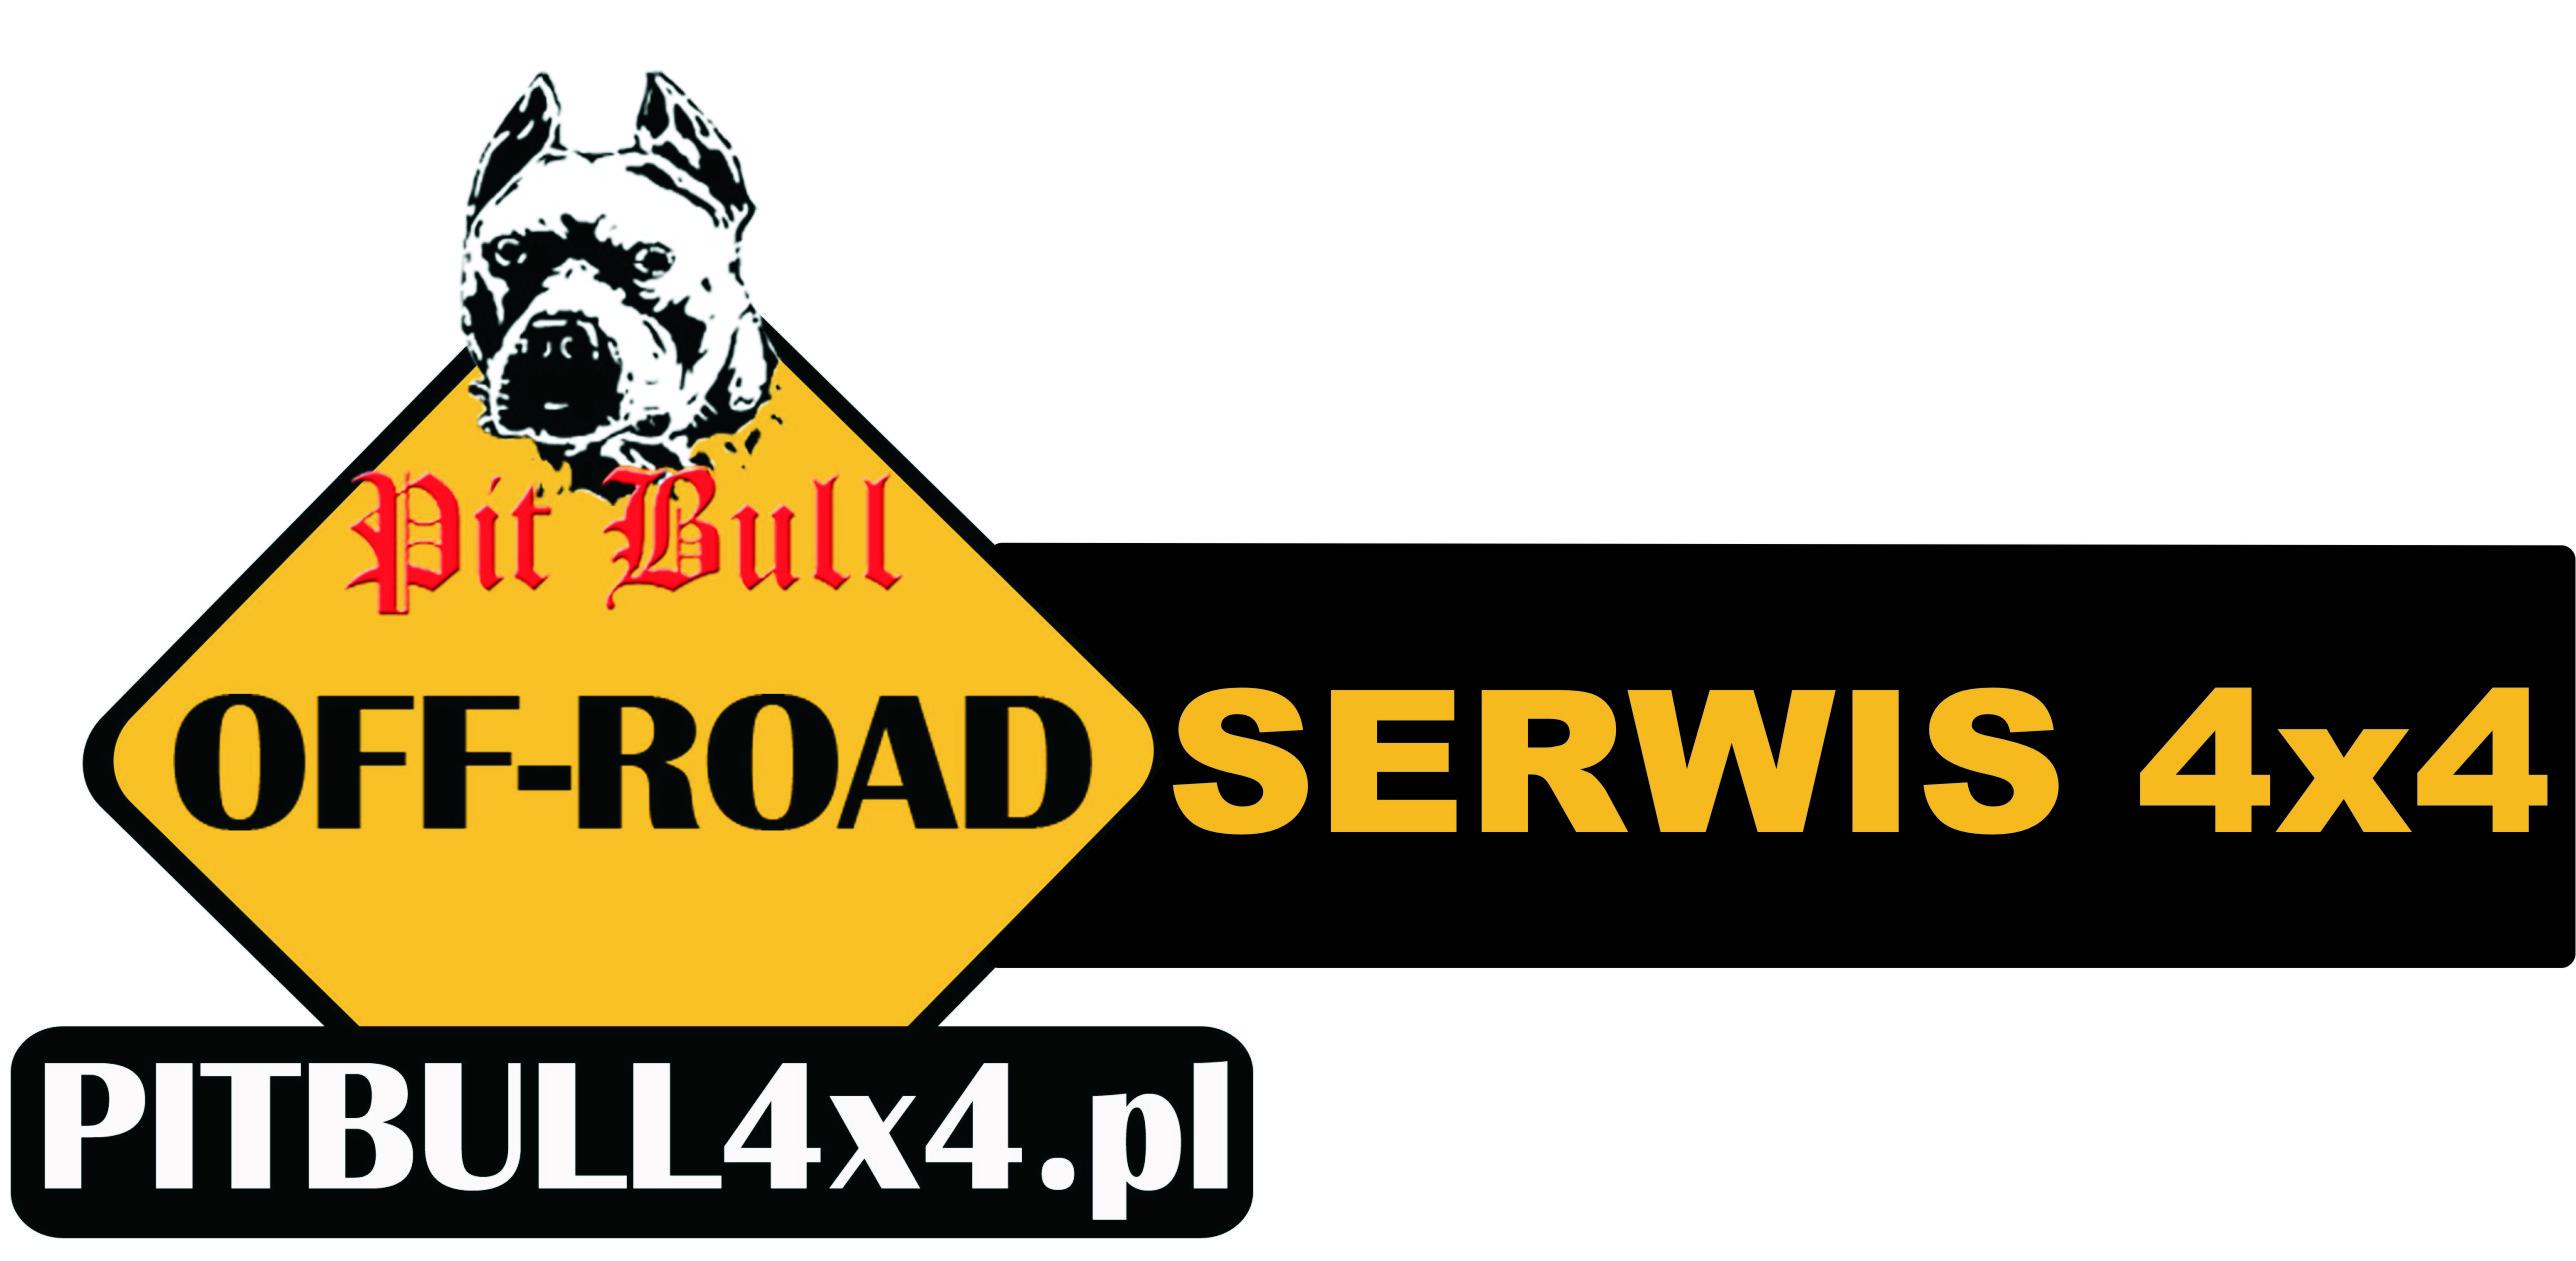 Logopitbull1_jpg